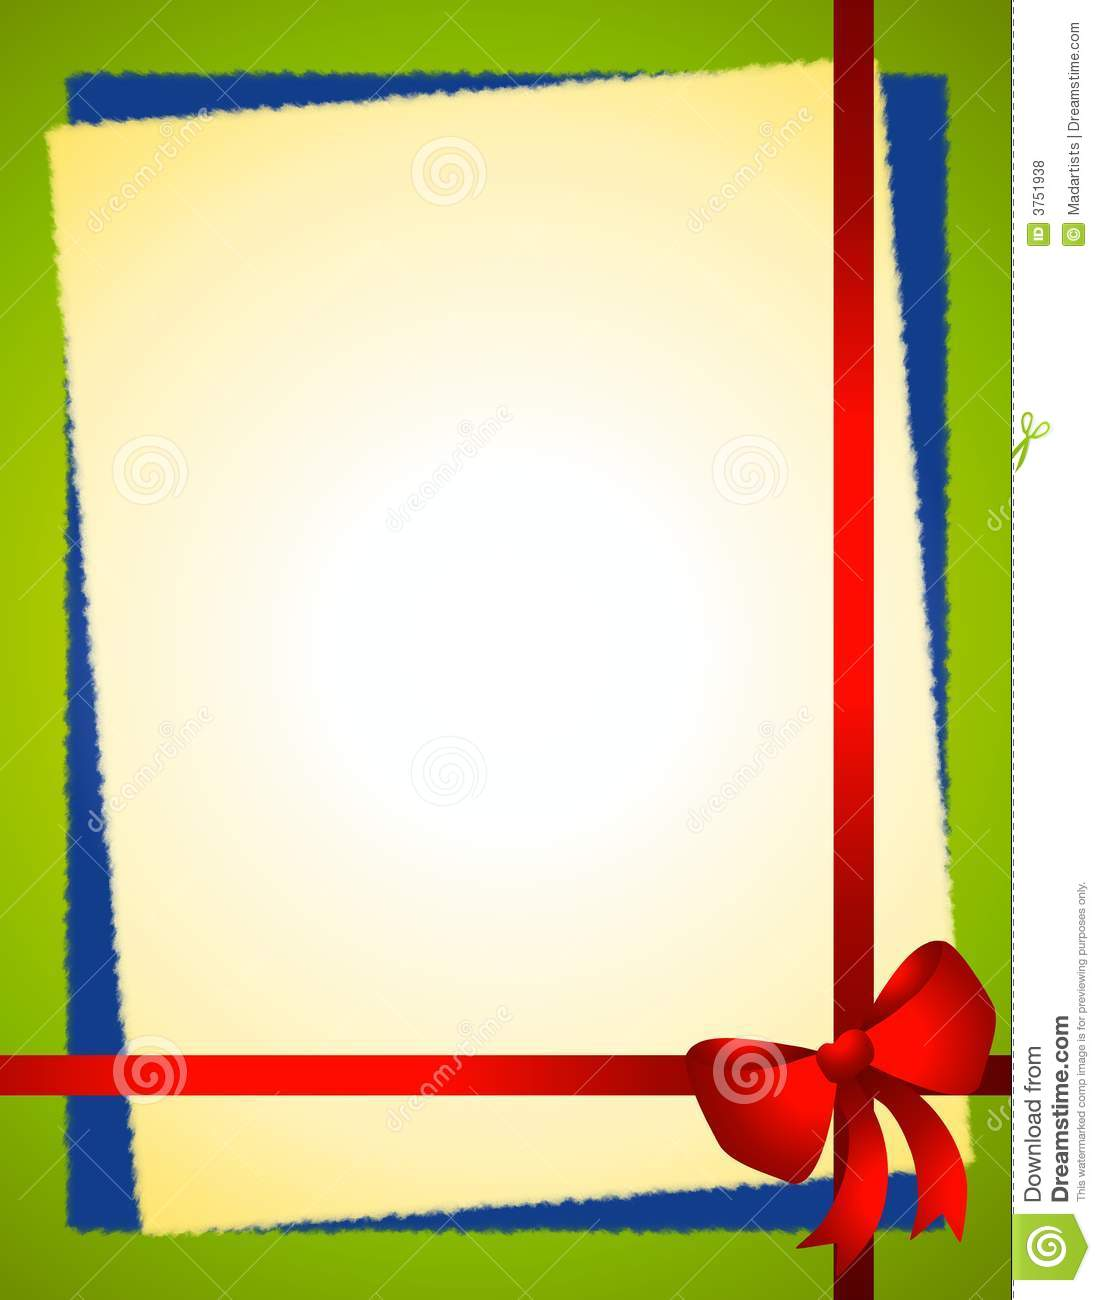 Blue Bow Border Clipart - Clipart Kid